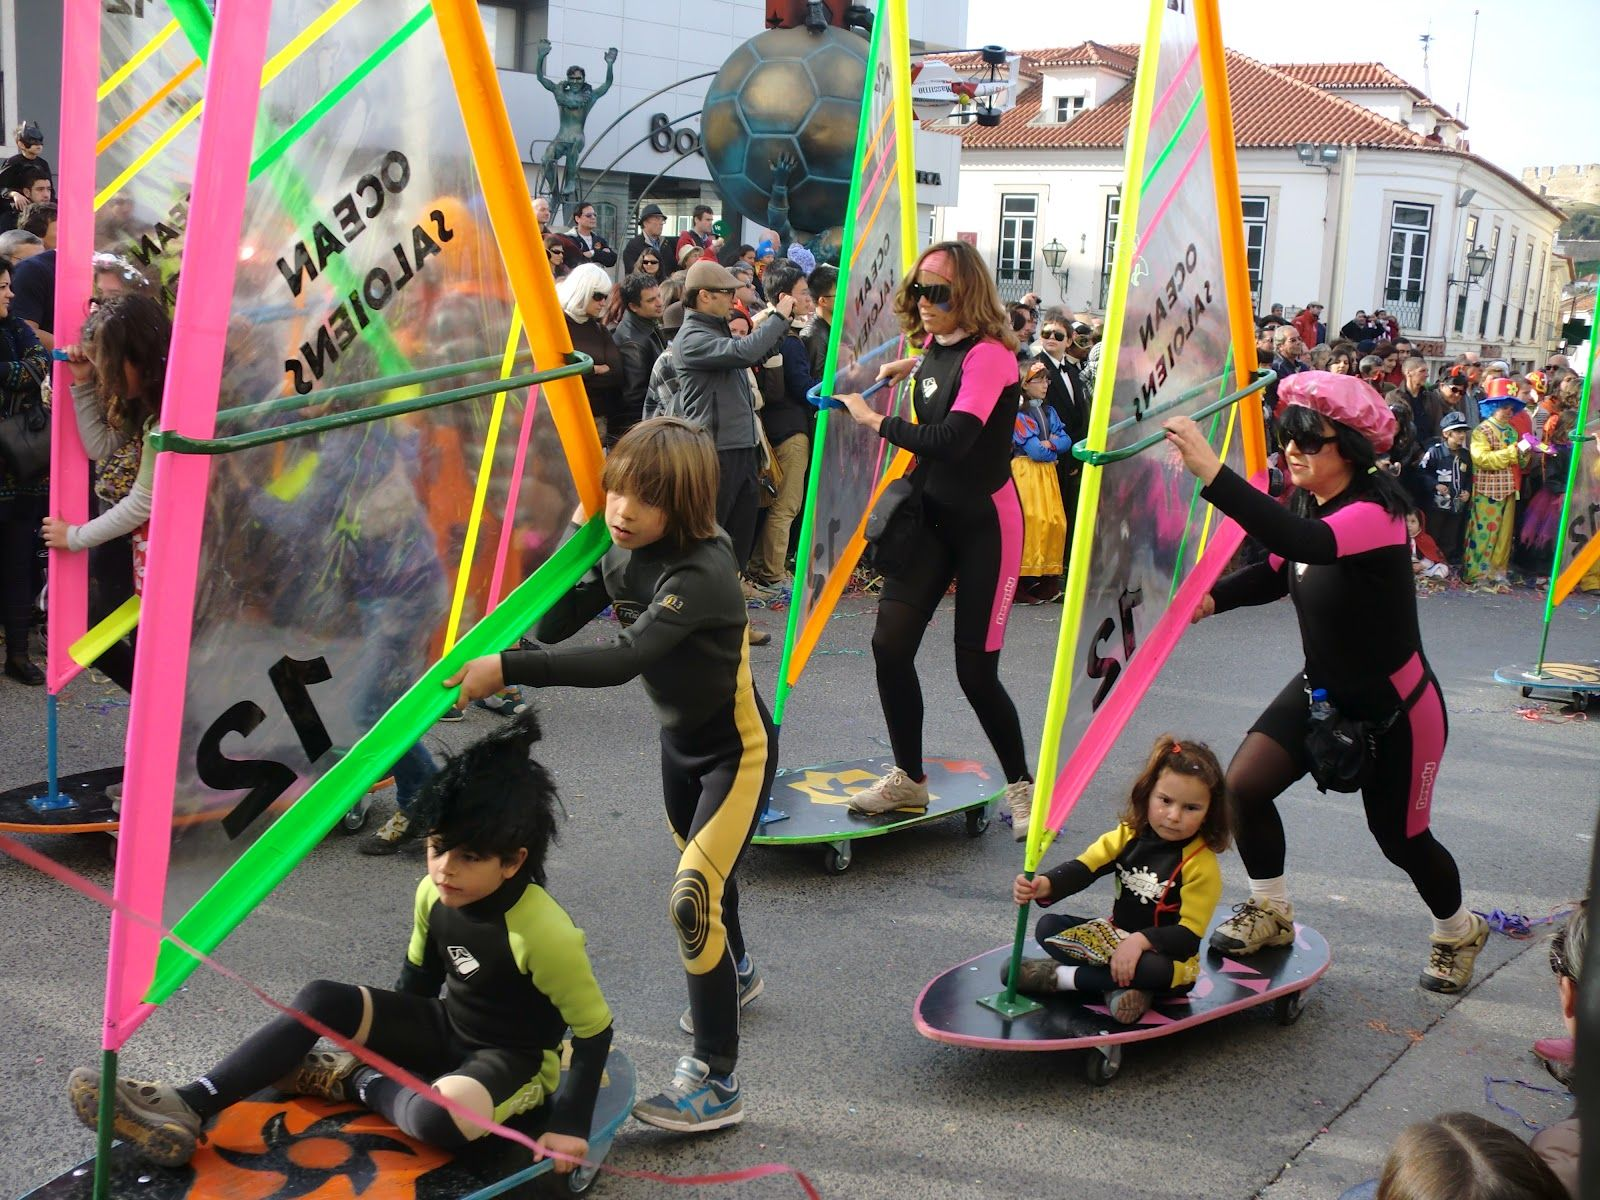 Carnaval de Torres Vedras #carnaval #torres #vedras #portugal hotesi desde 55€ => http://bit.ly/1vpUwlo